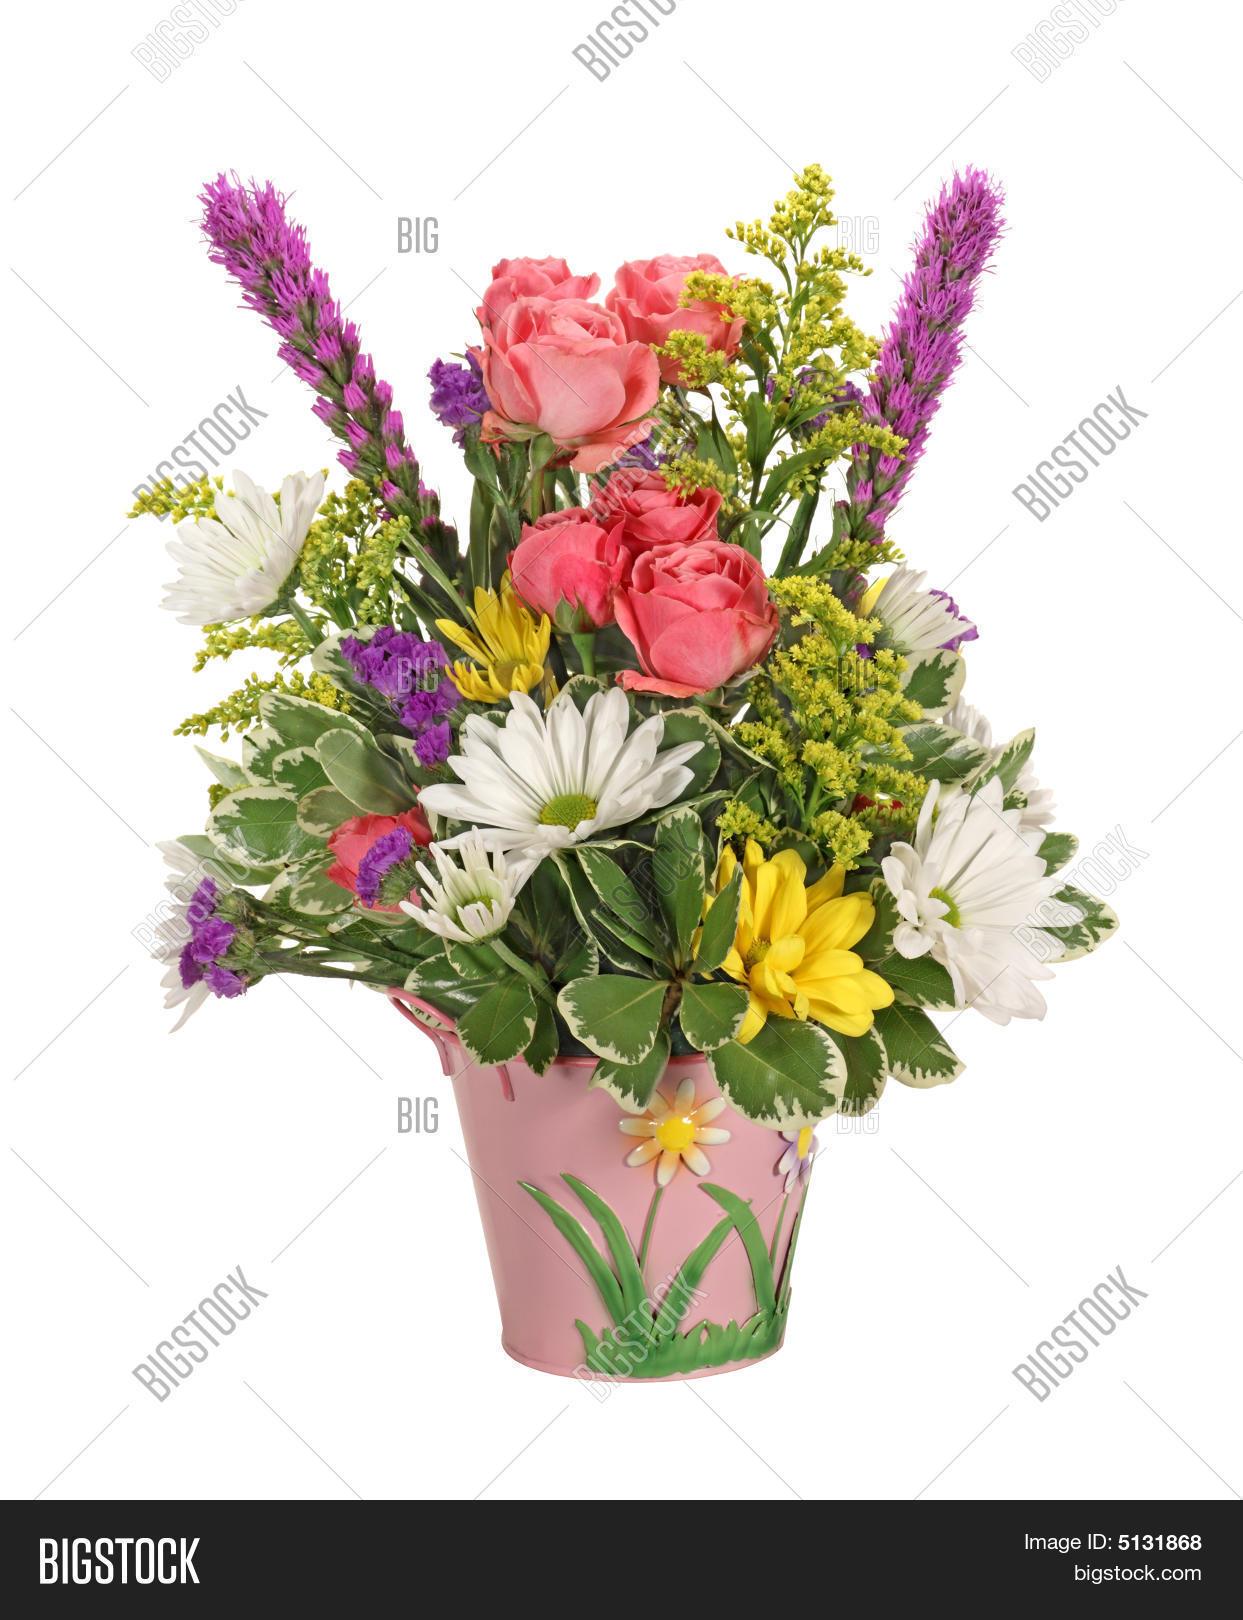 Flower Bouquet Image Photo Free Trial Bigstock